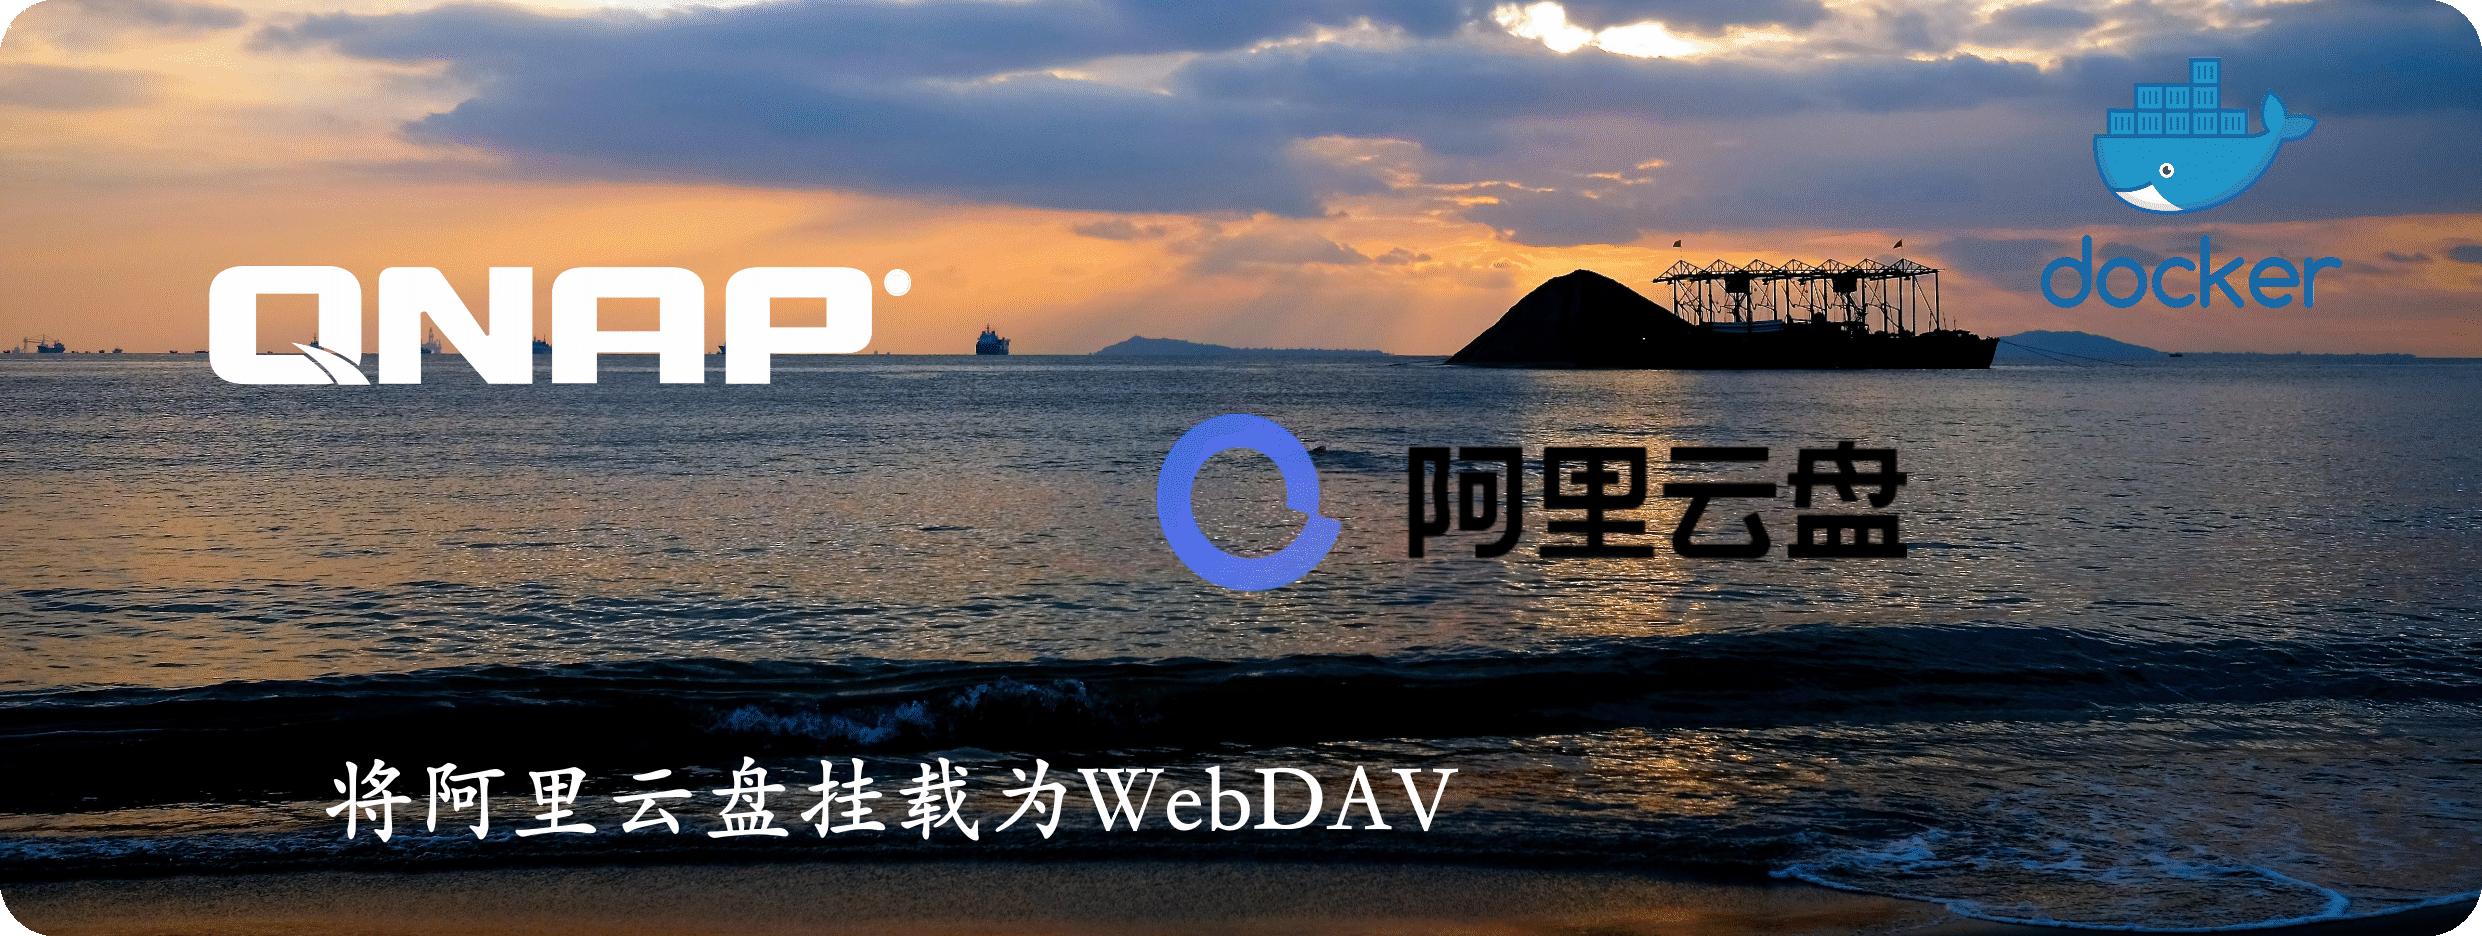 QNAP 威联通Docker安装插件实现阿里云盘WebDAV挂载